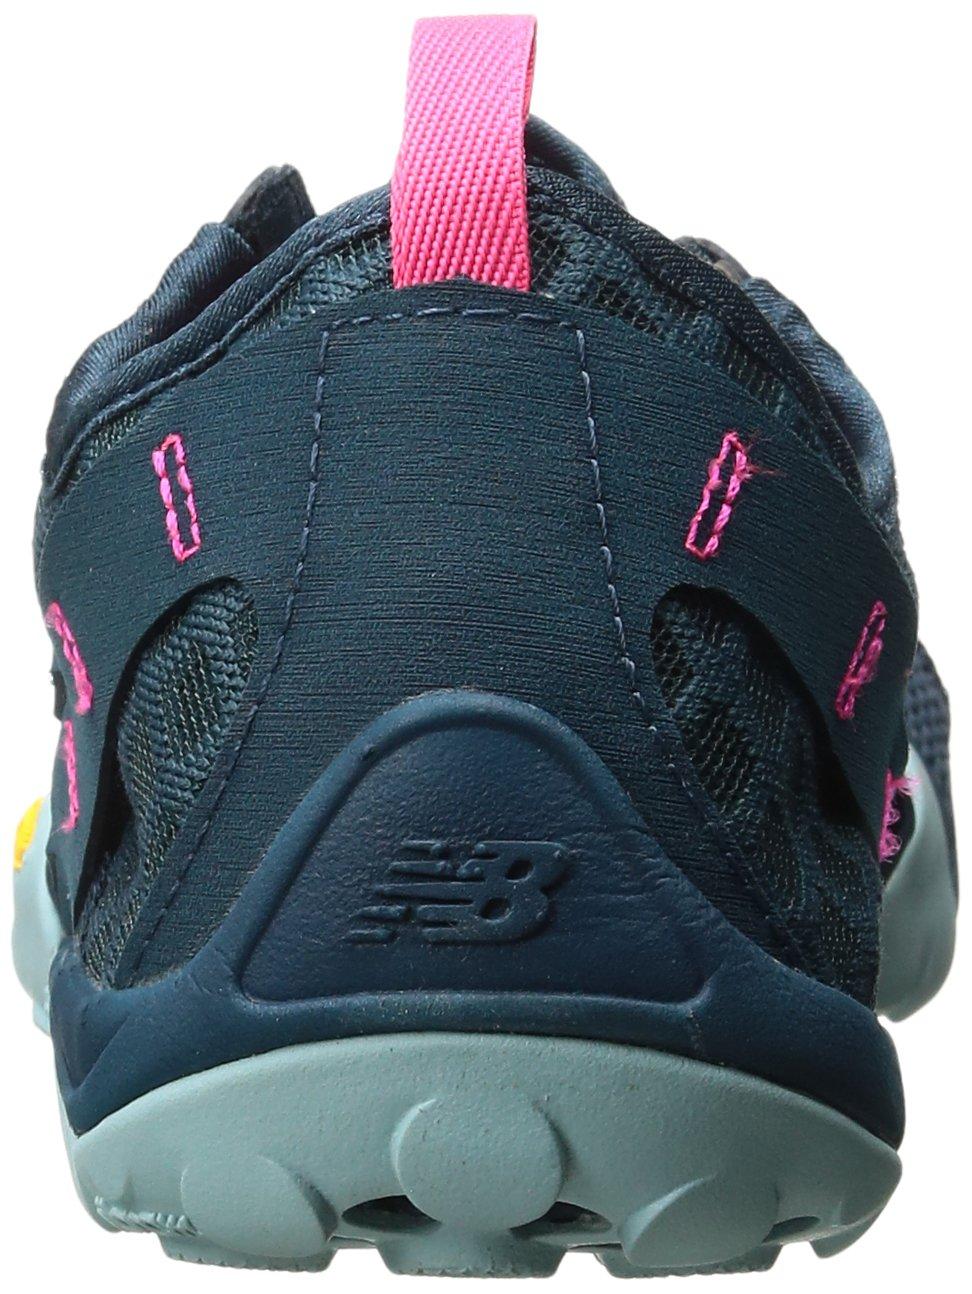 New Balance Women's WT10v1 Minimus Trail Running Shoe B01FSIU292 12 D US|Grey/Blue